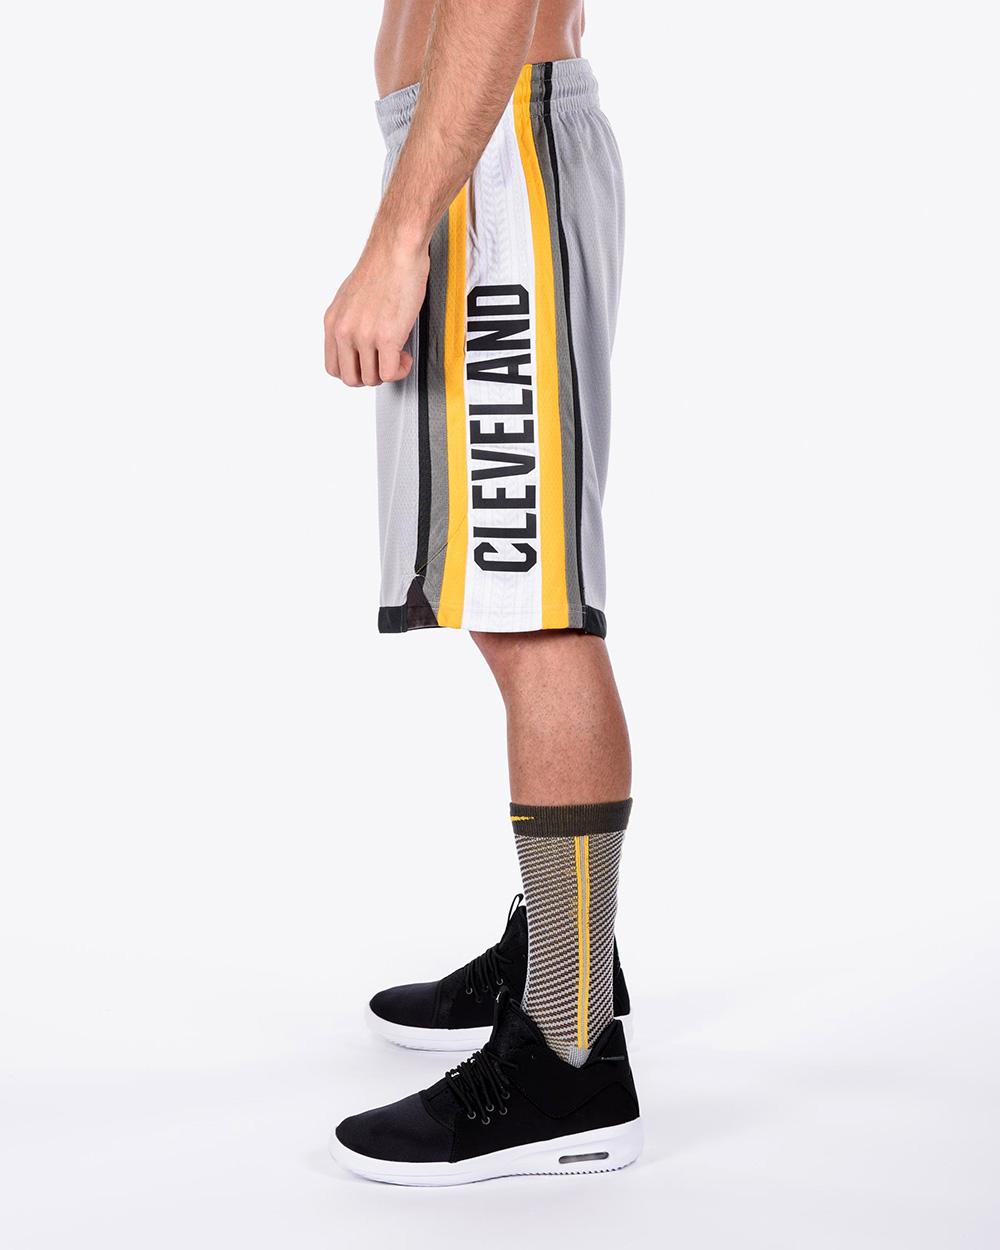 c0bf893fc Nike NBA Cleveland Cavaliers City Edition Swingman Shorts - NBA Shop ...